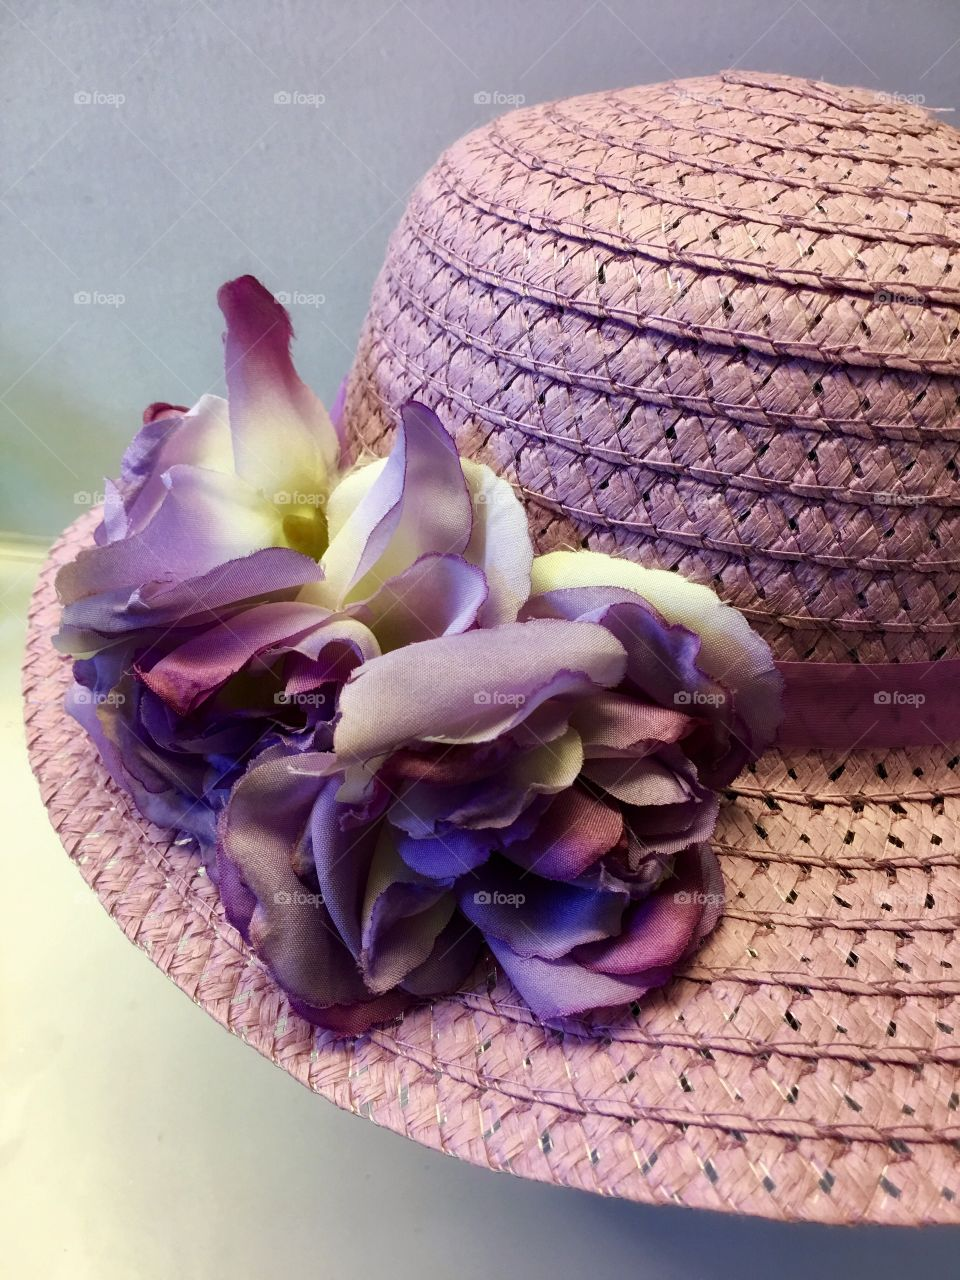 Closeup of purple hat